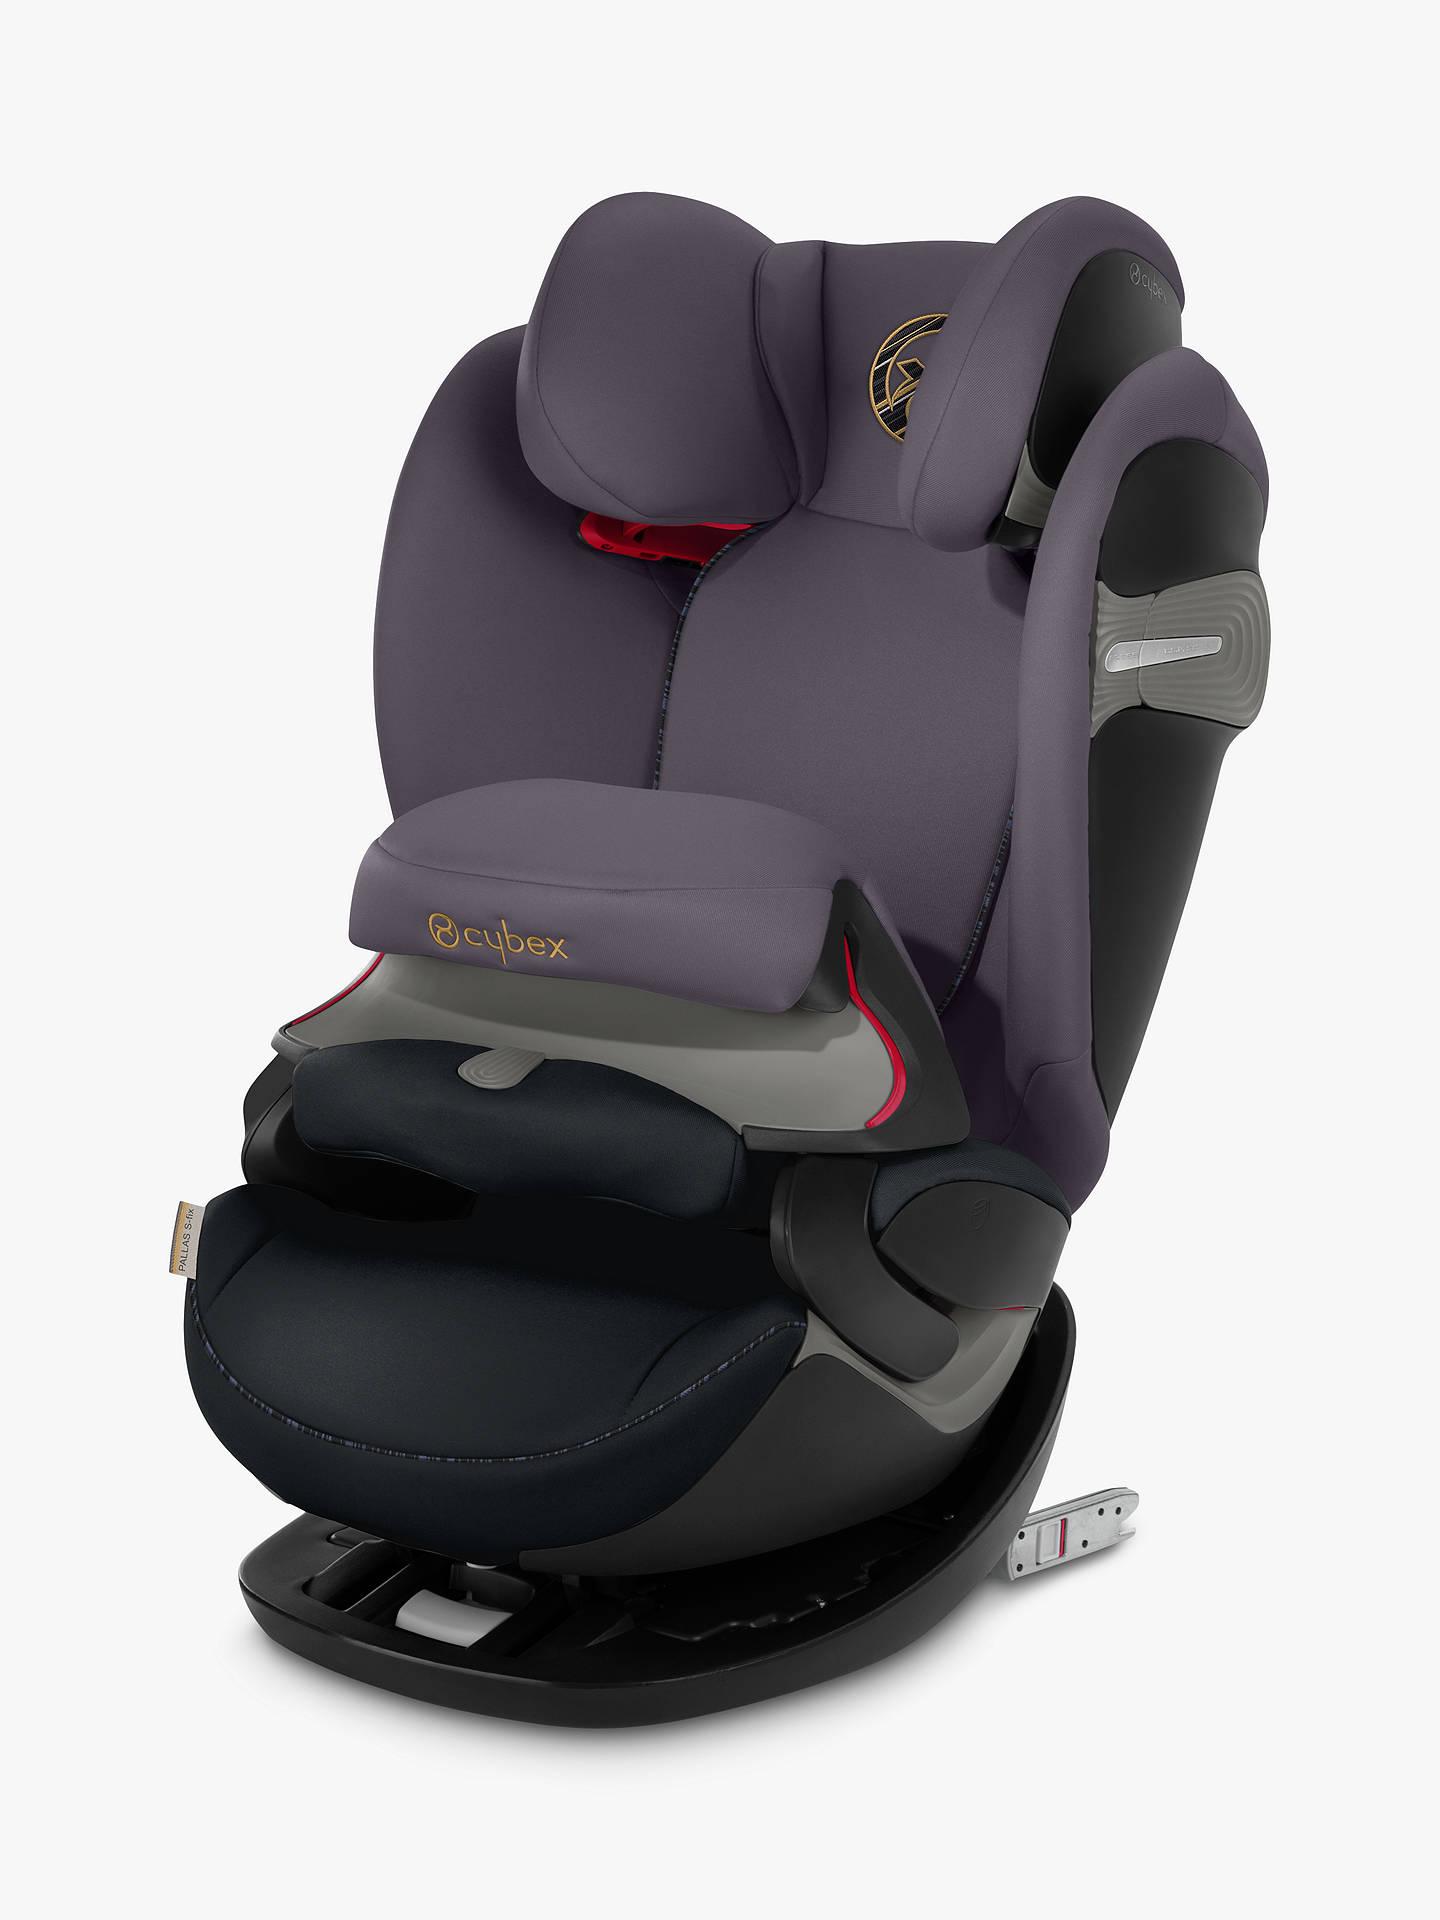 Cybex Pallas S Fix Group 1/2/3 Car Seat, Premium Black by Cybex